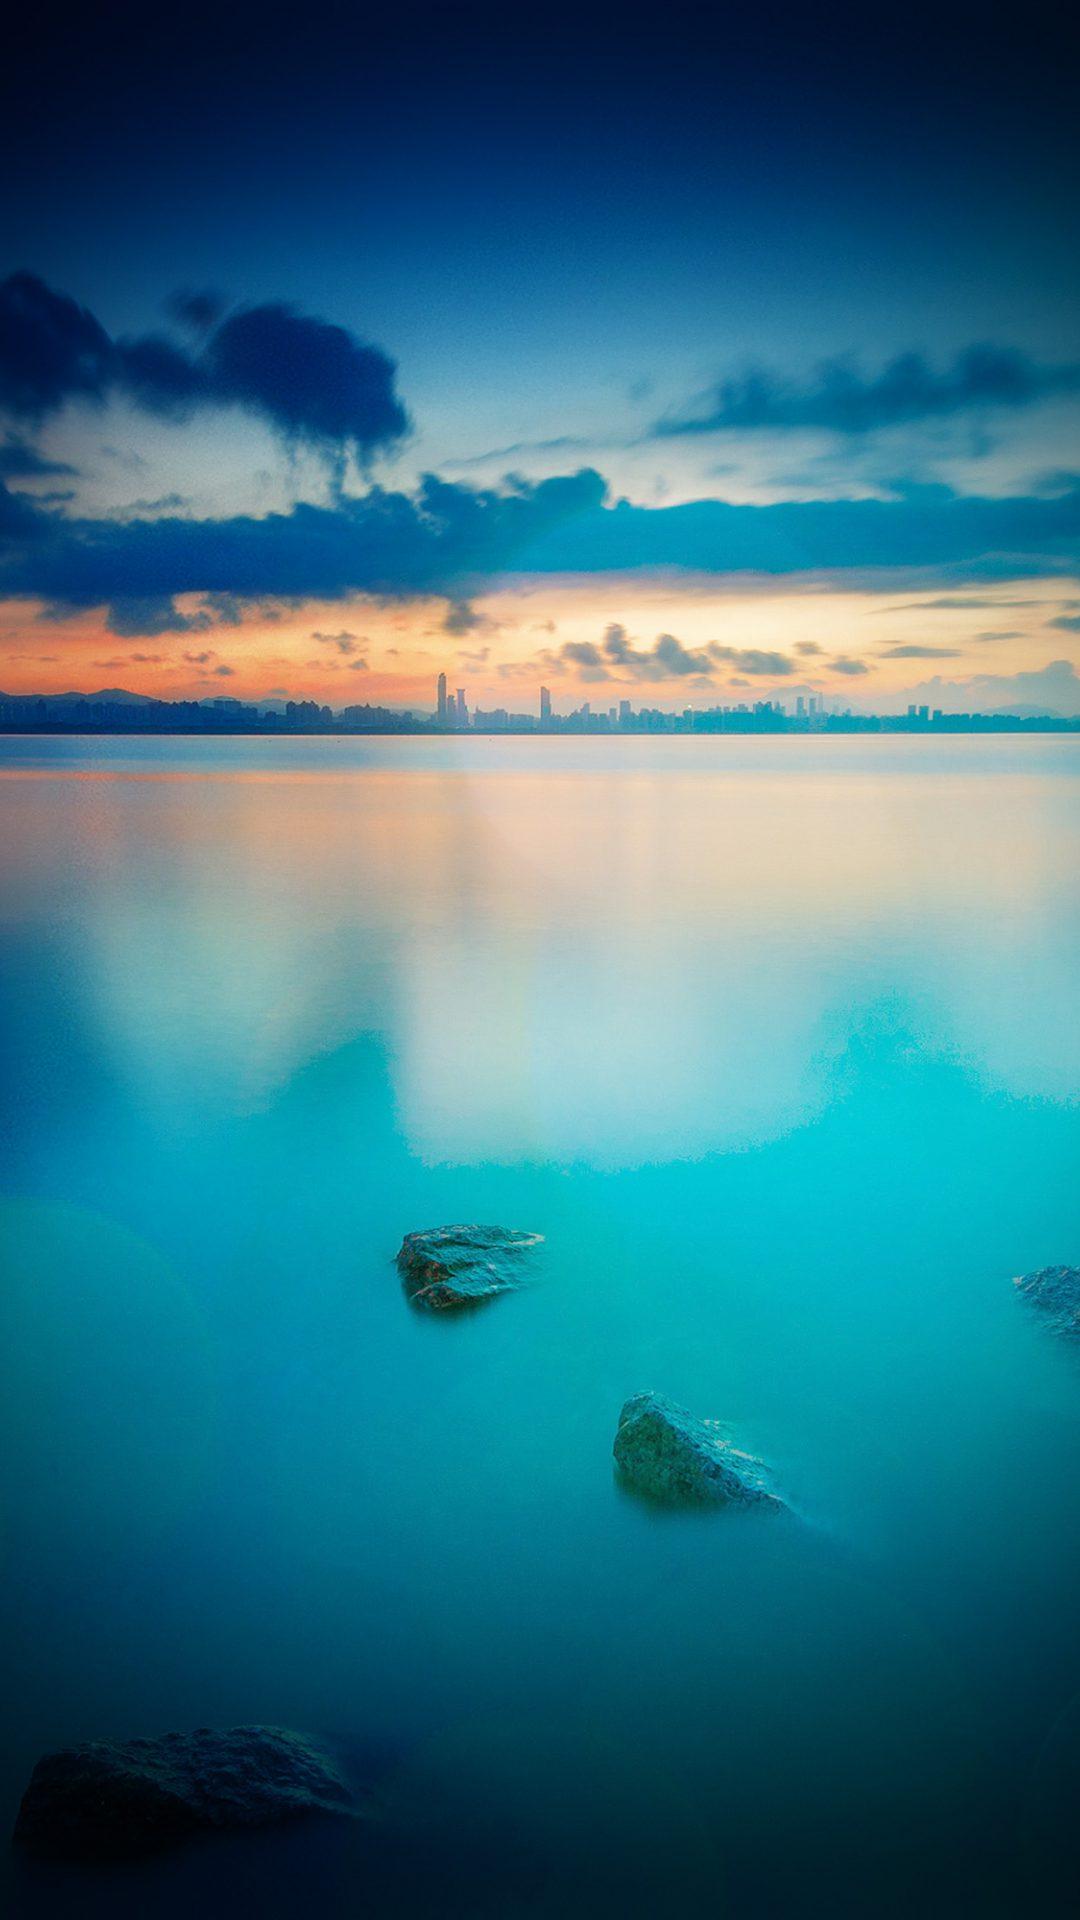 City View River Lake Blue Sunset Nature Vignette Bokeh